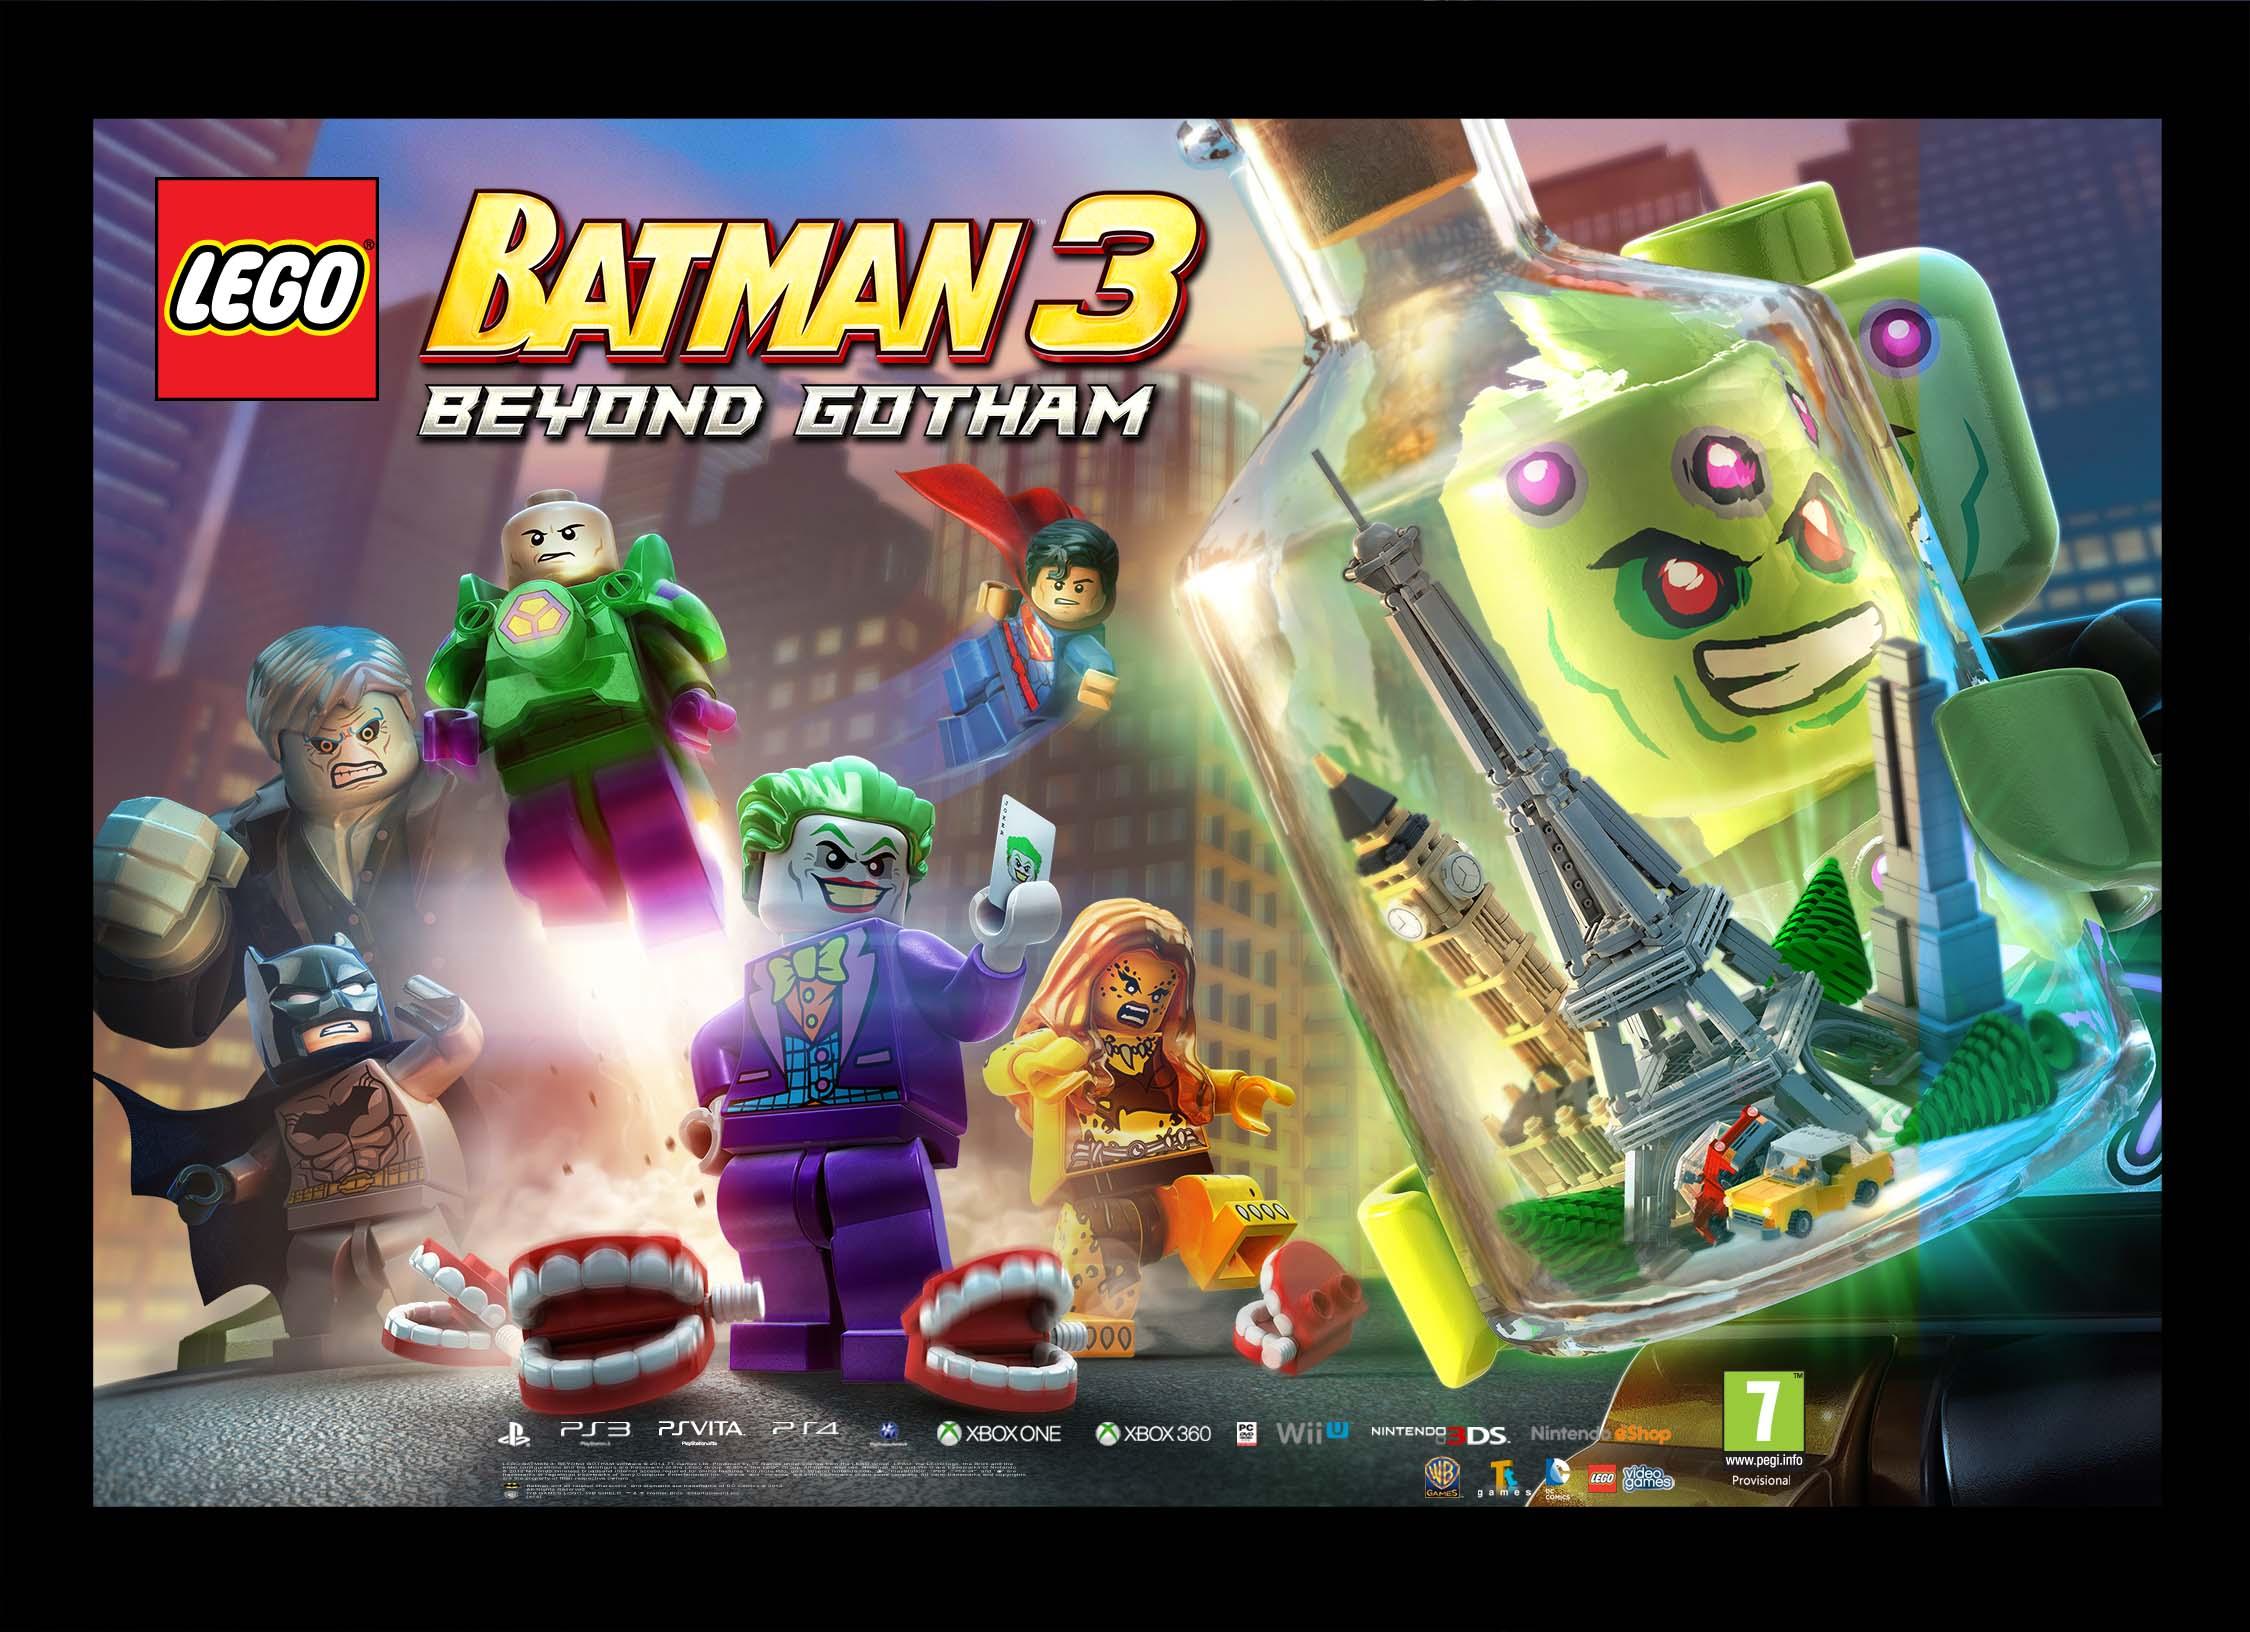 New LEGO Batman 3 Brainiac trailer and artwork released ...